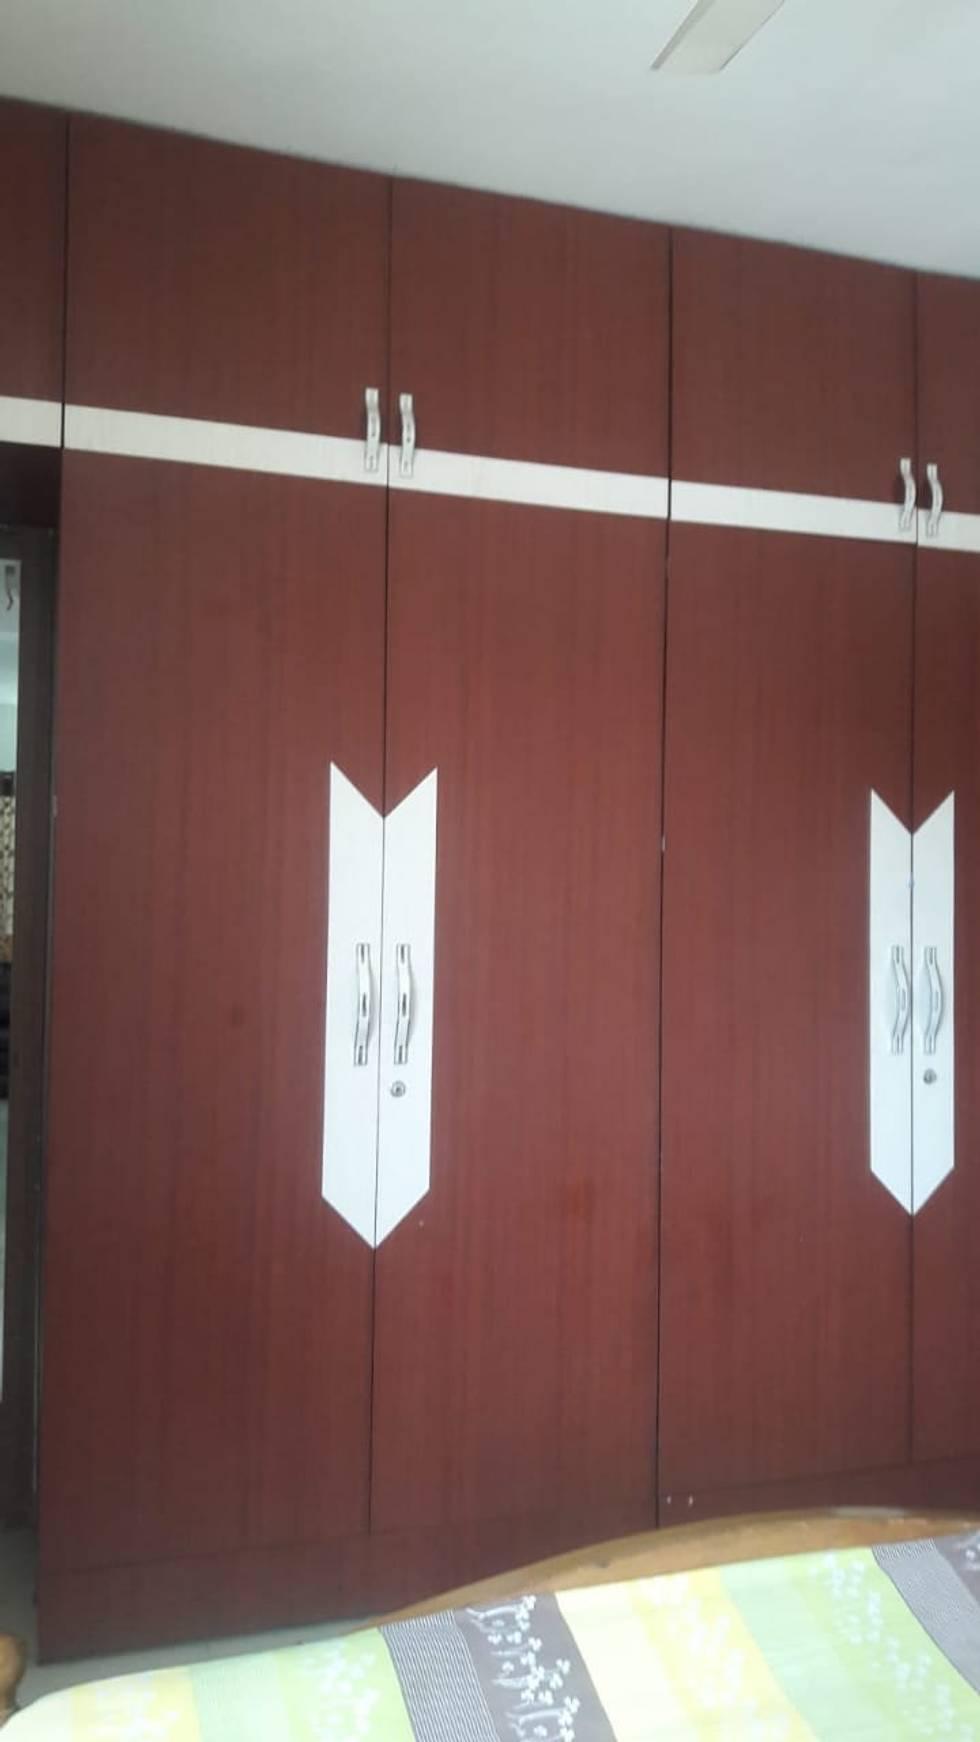 Wardrobe design ideas from interior designers and decorators in Pune